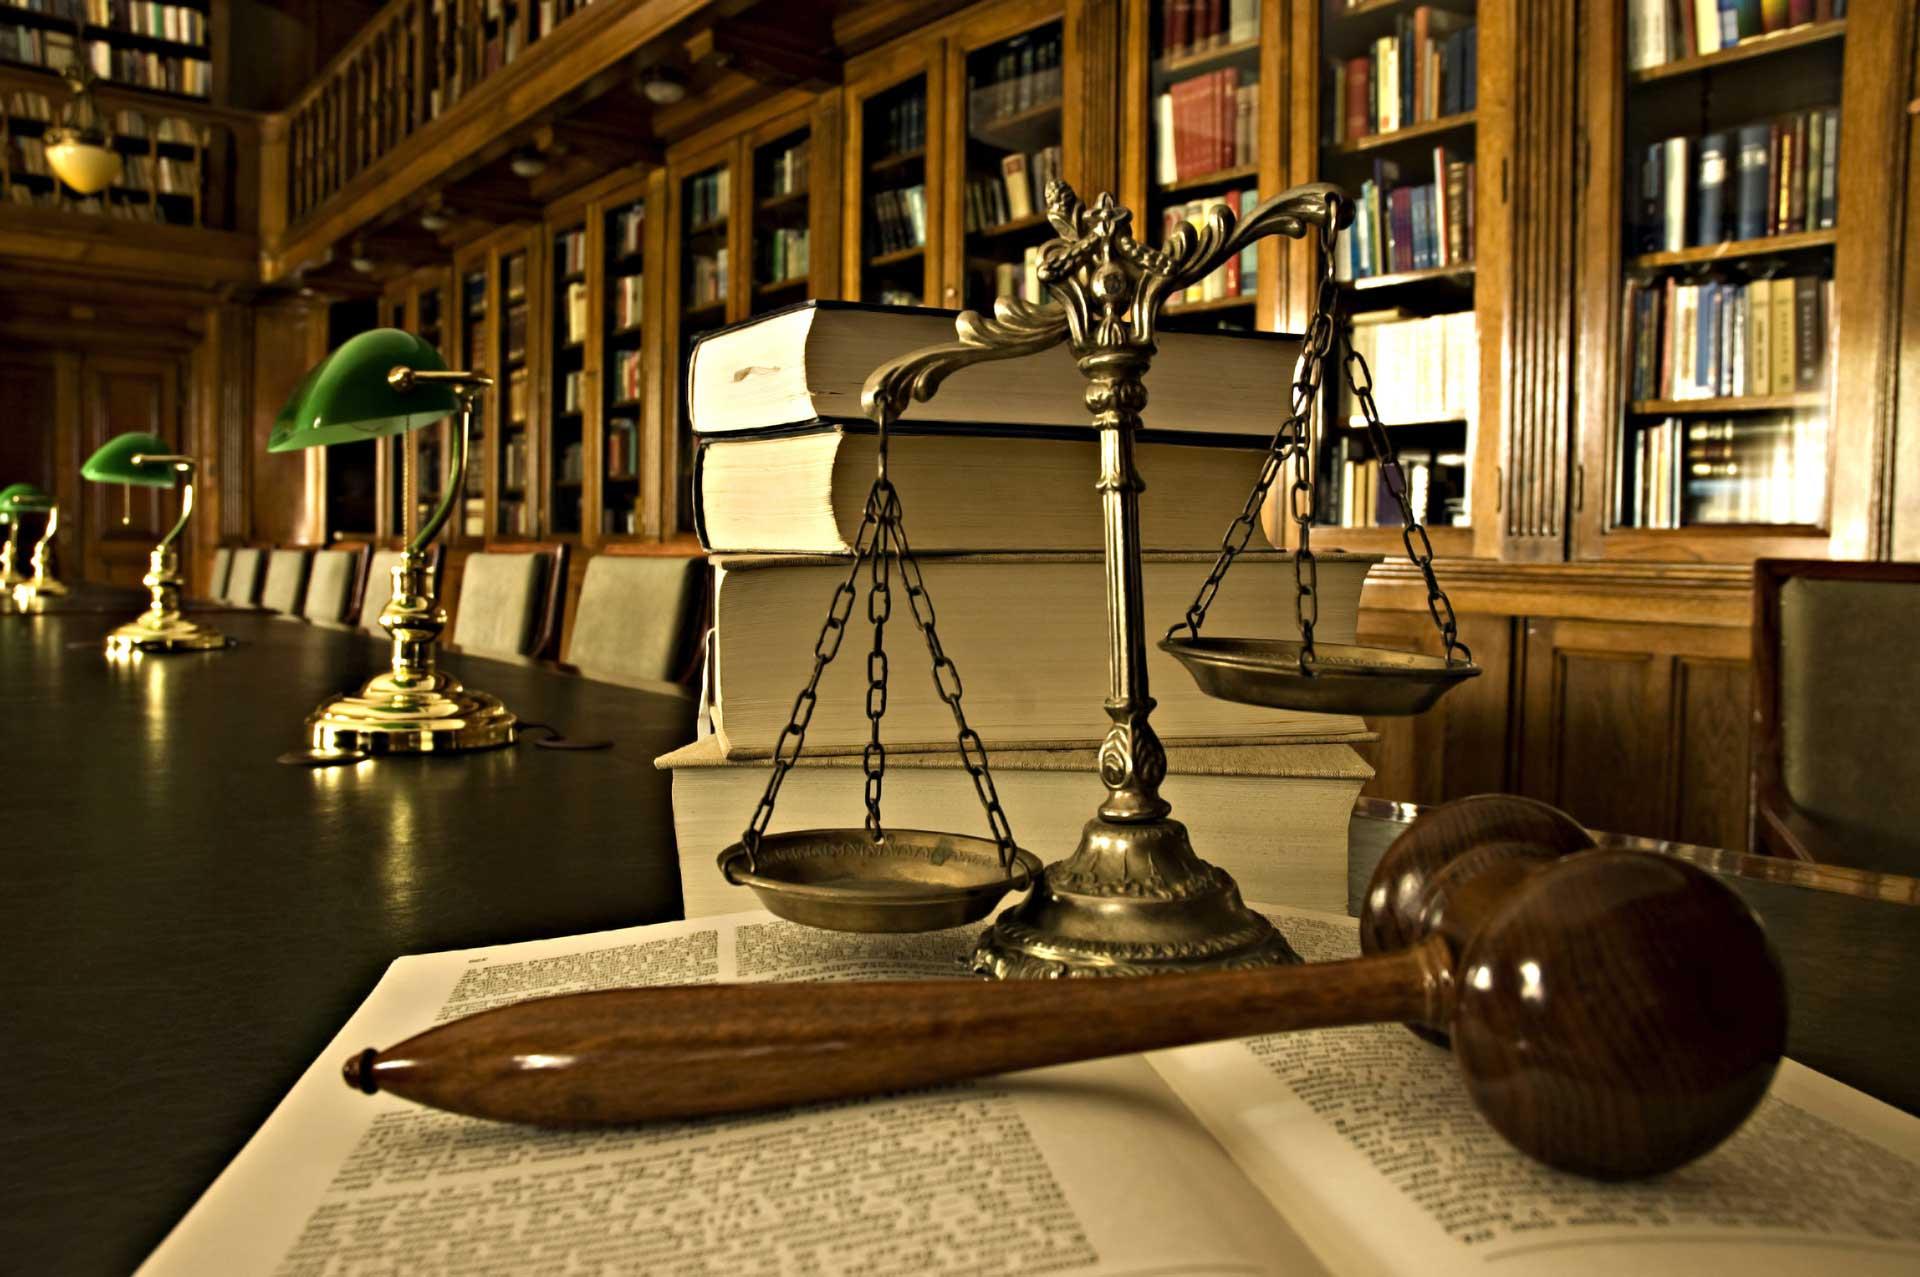 İnternette Biz - Adana Avukat Saim İncekaş